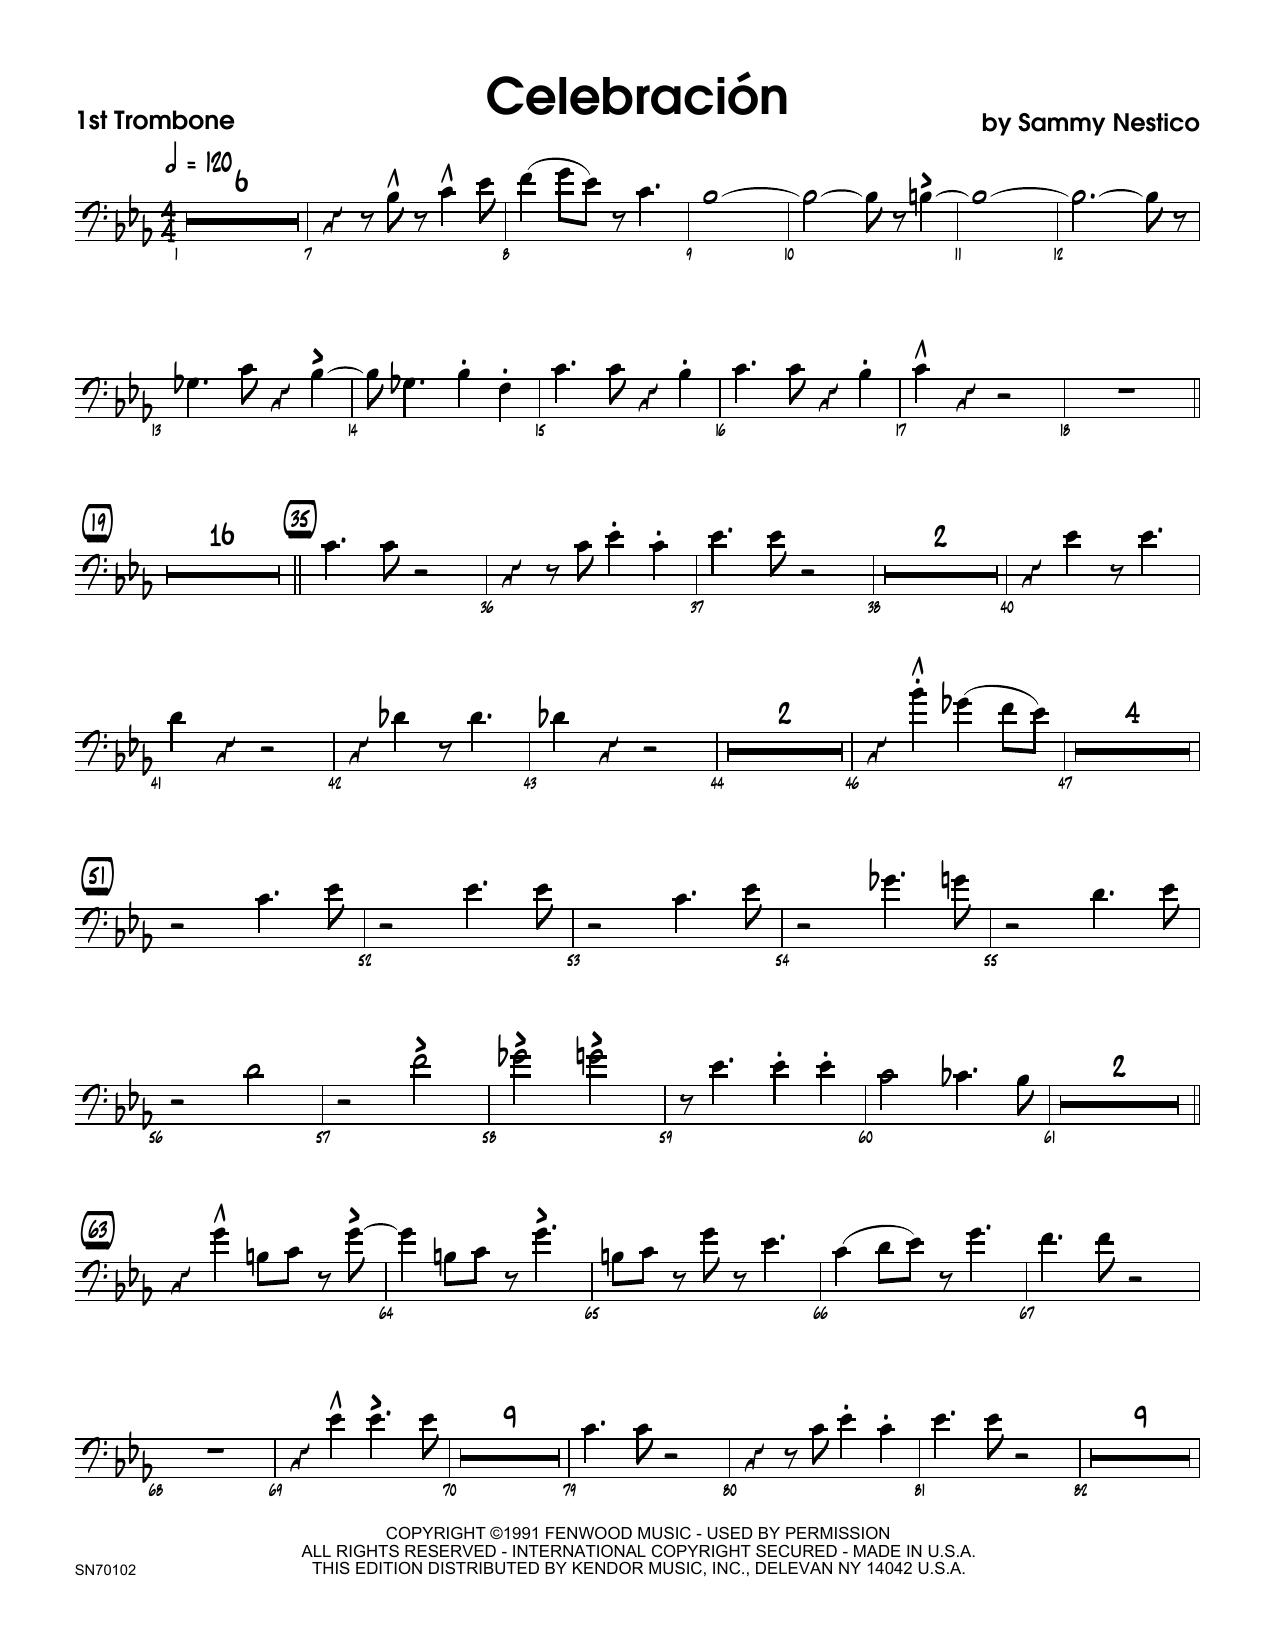 Celebracion - 1st Trombone Sheet Music